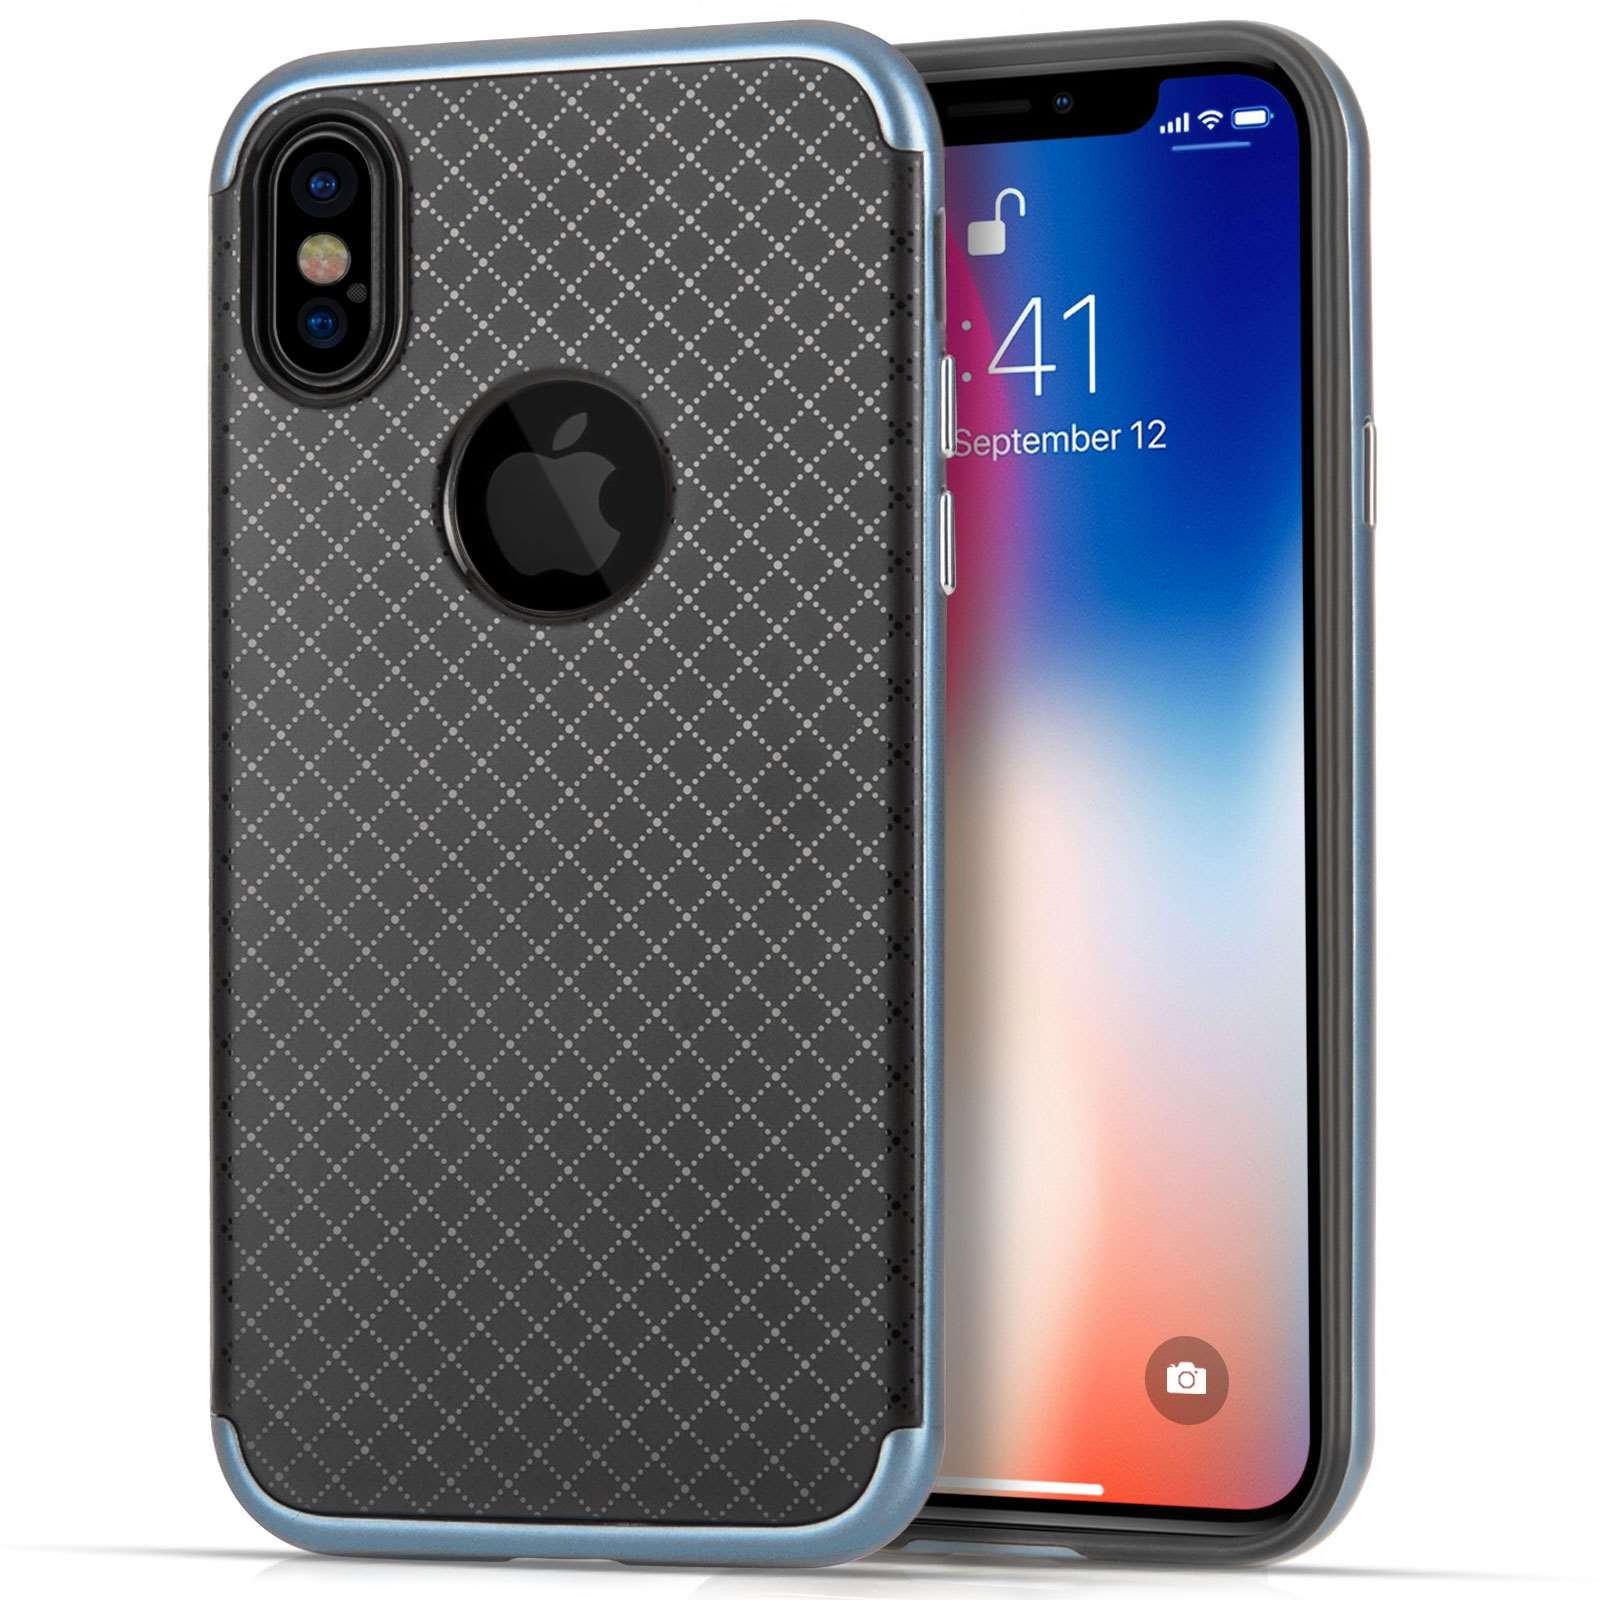 Centopi Θήκη Crosshatch iPhone X / XS - Black / Silver (CEN-APP-125)